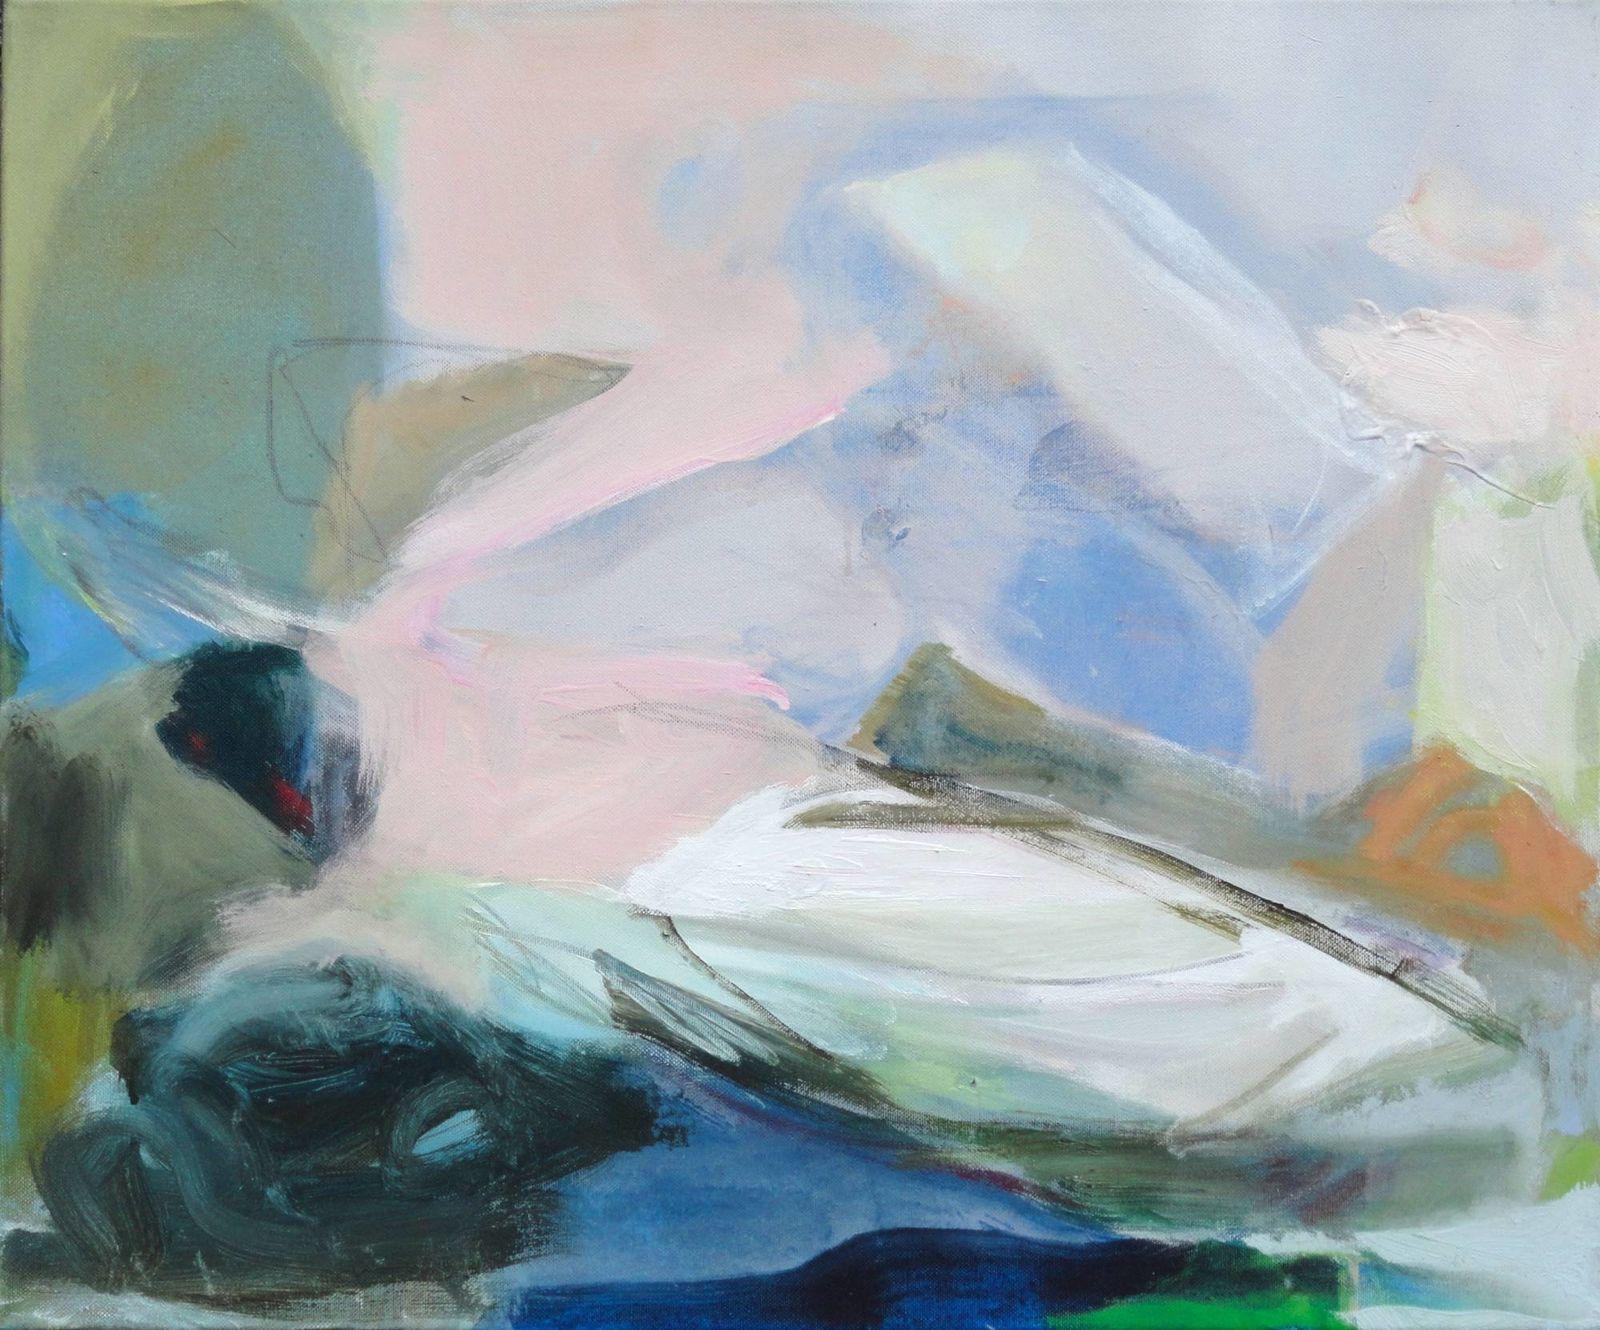 """Ankunft in rosa"", 2015. Acryl auf Leinand, 54 x 60 cm"